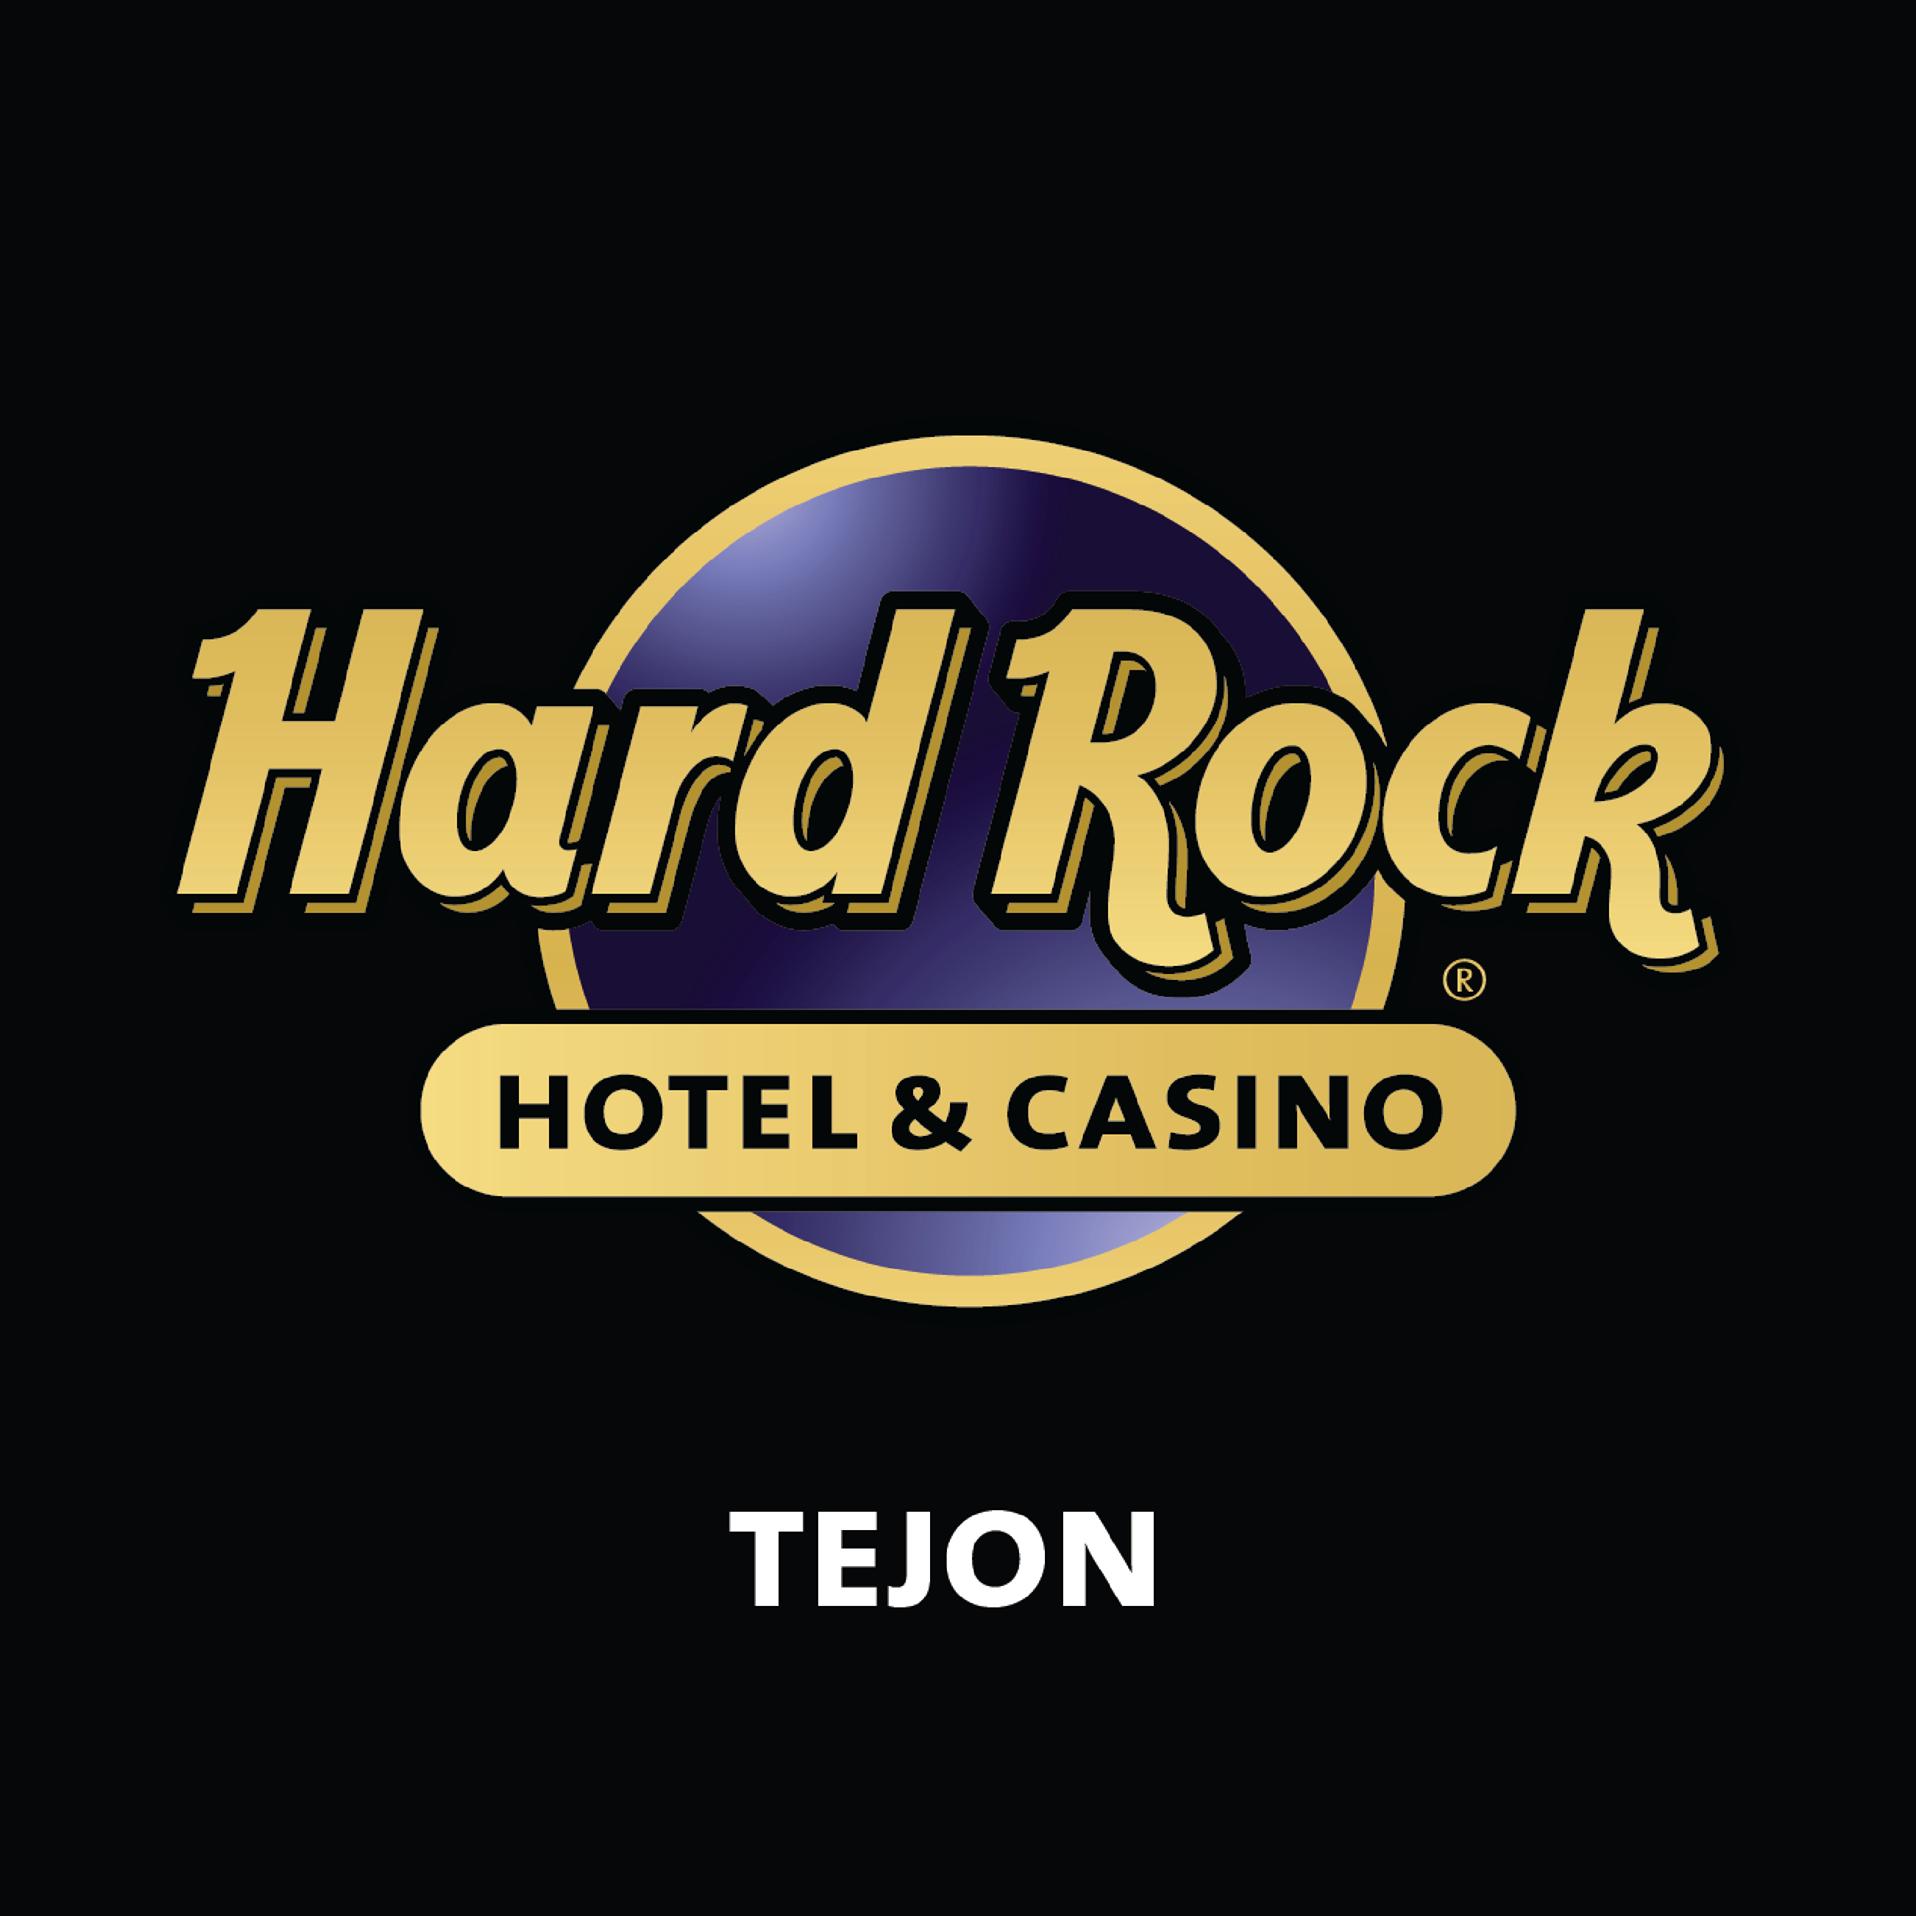 Hard Rock Hotel & Casino Tejon